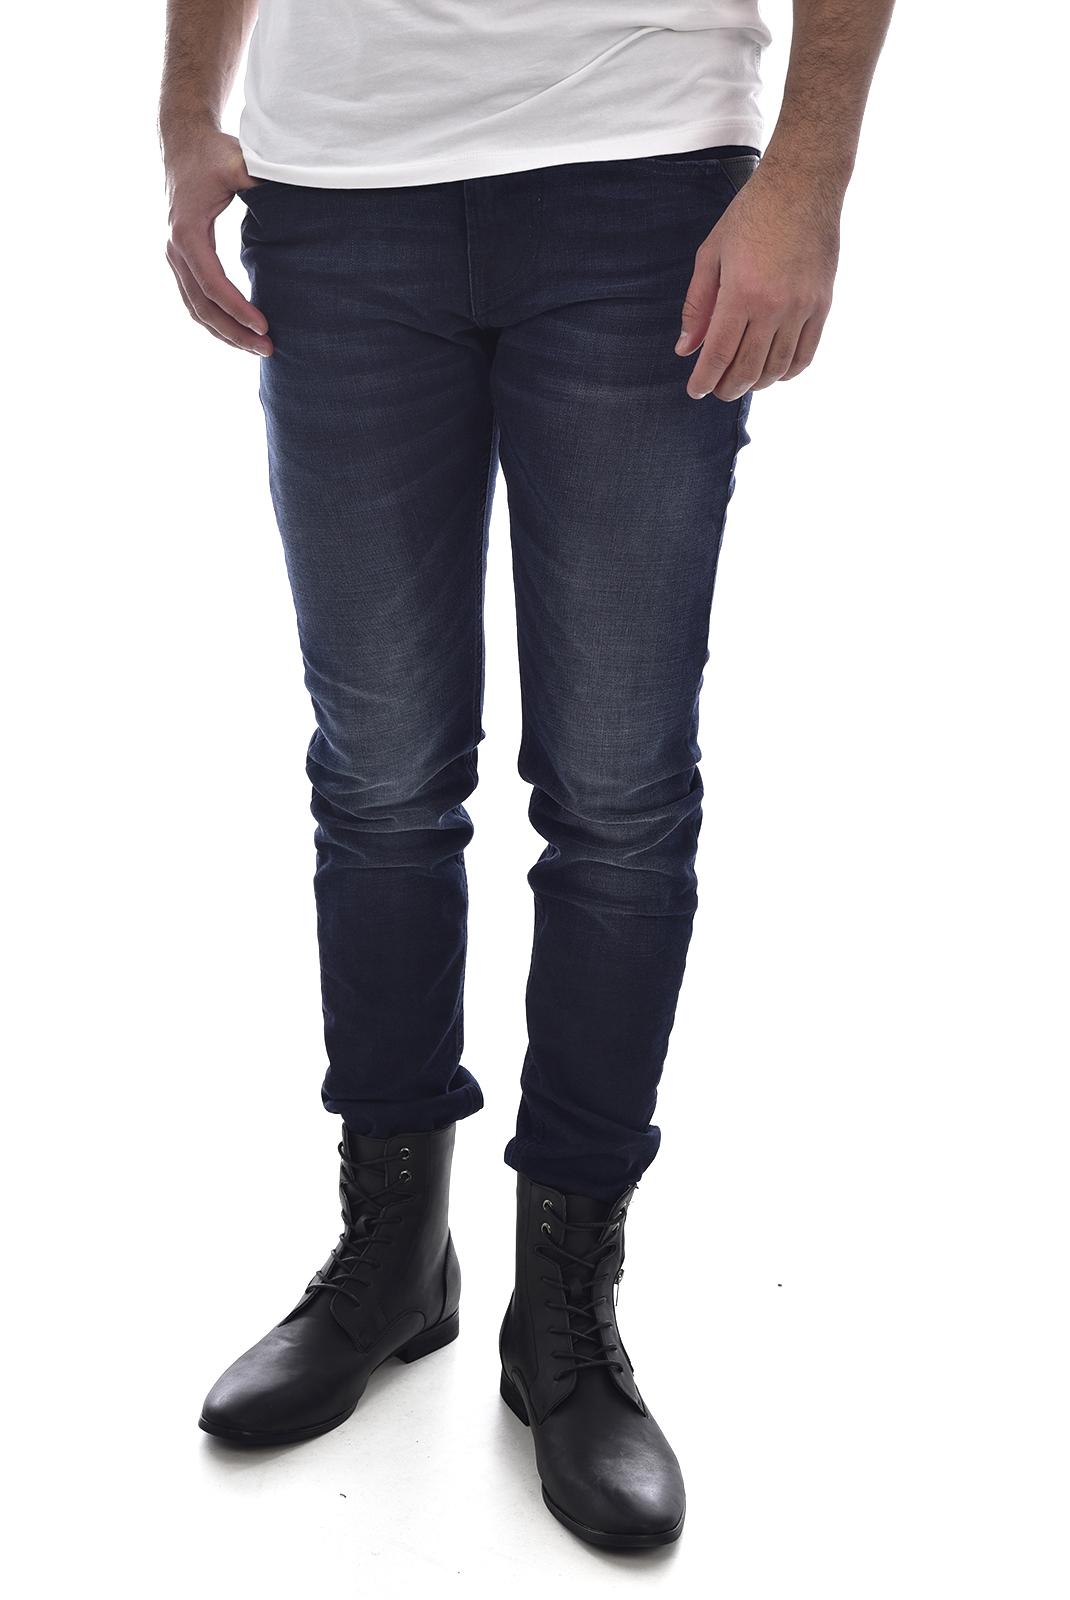 slim / skinny  Guess jeans M83A27 D37P0 CHRIS SKIDROW